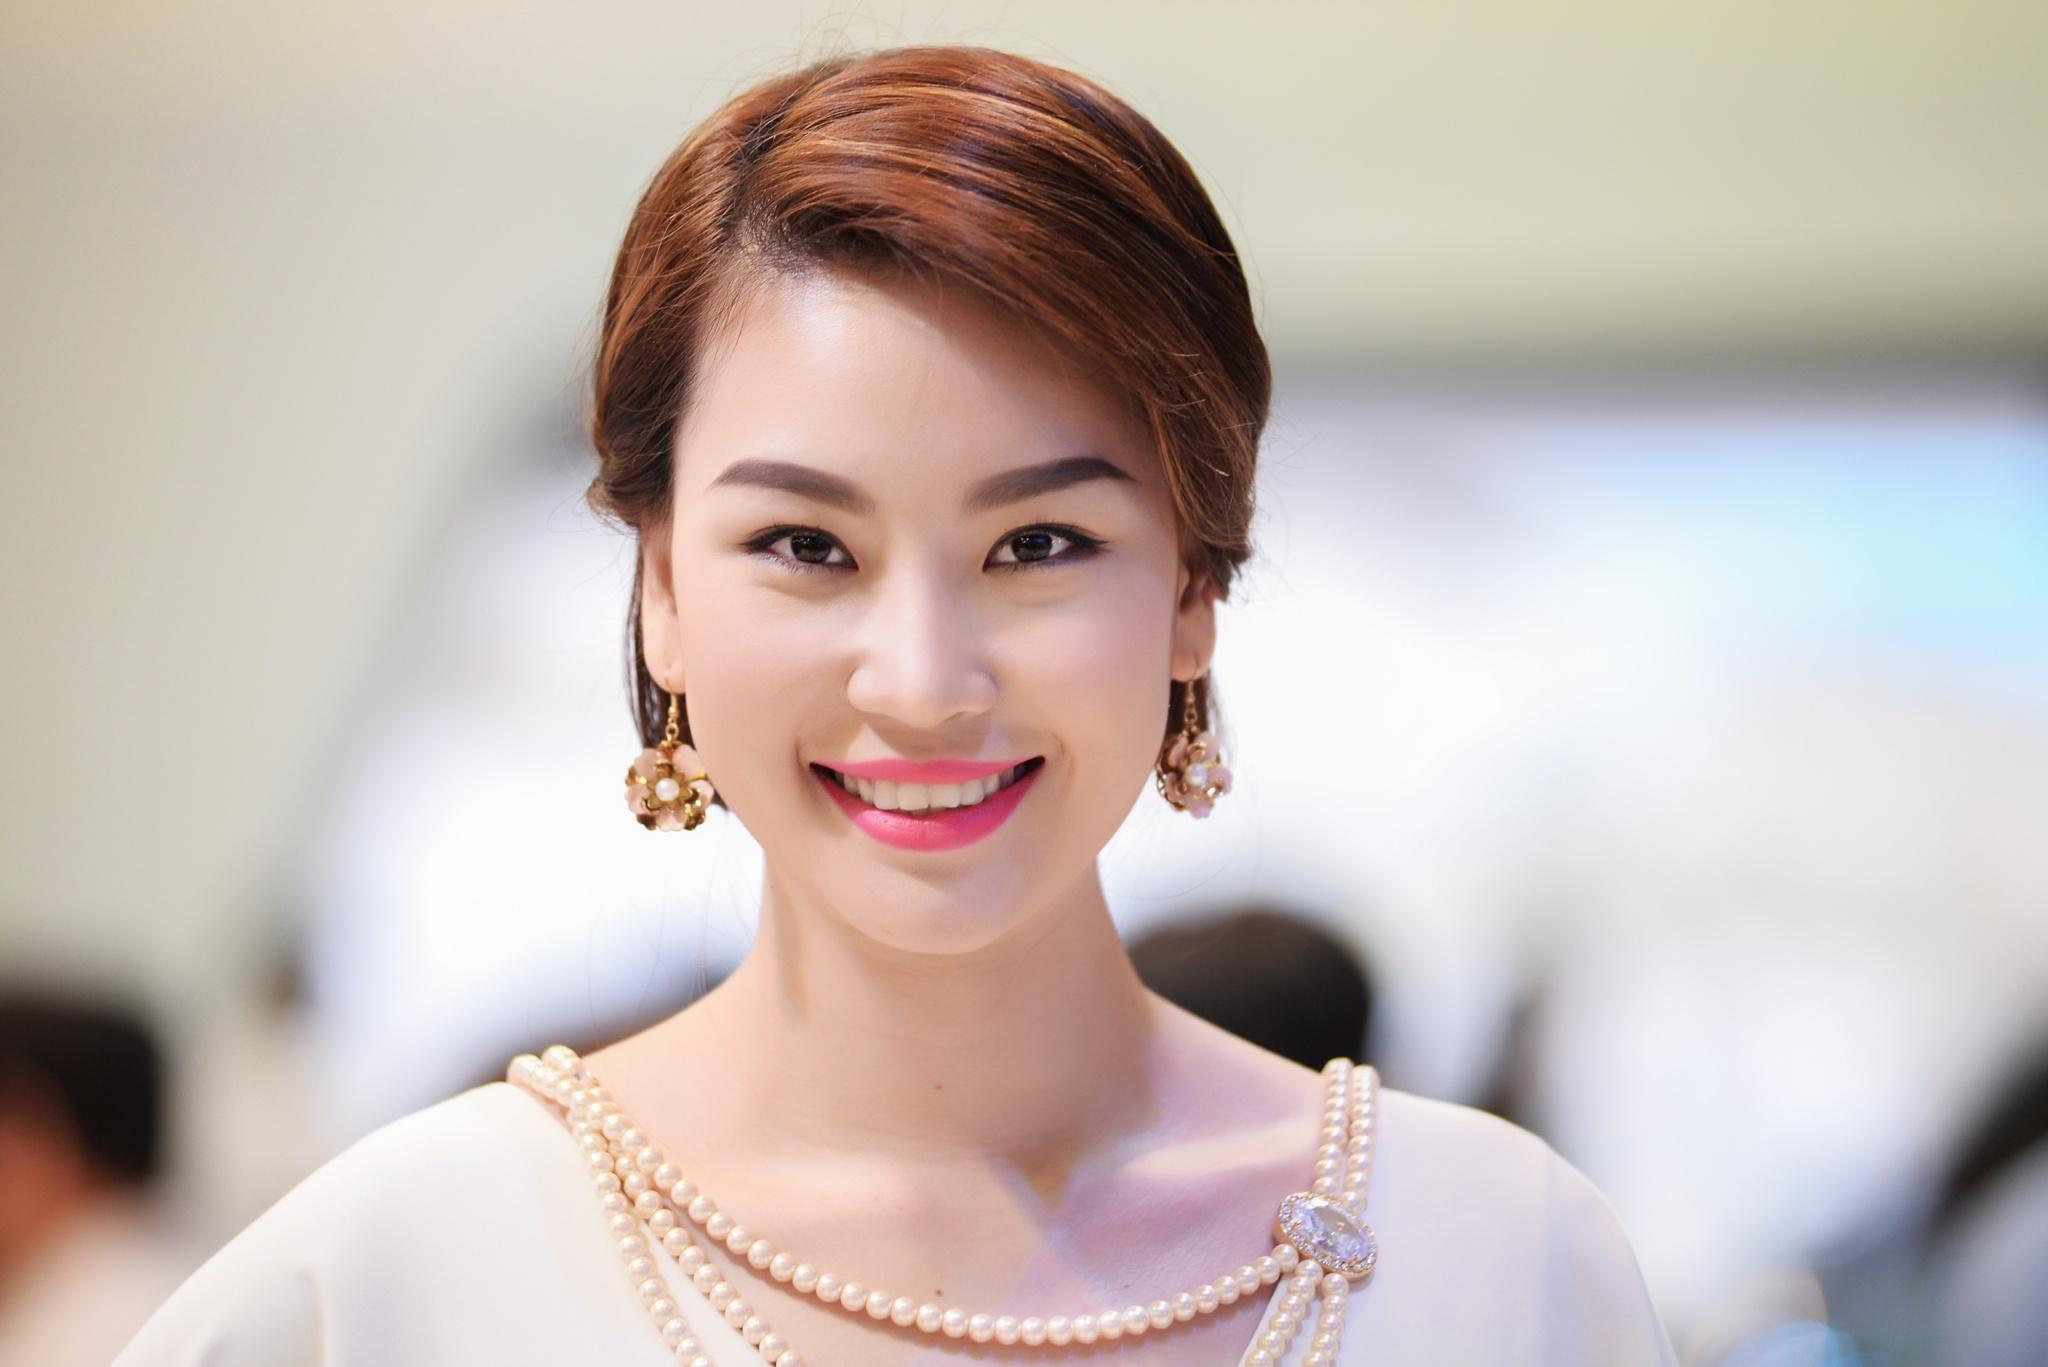 Smiles by Trung Đặng